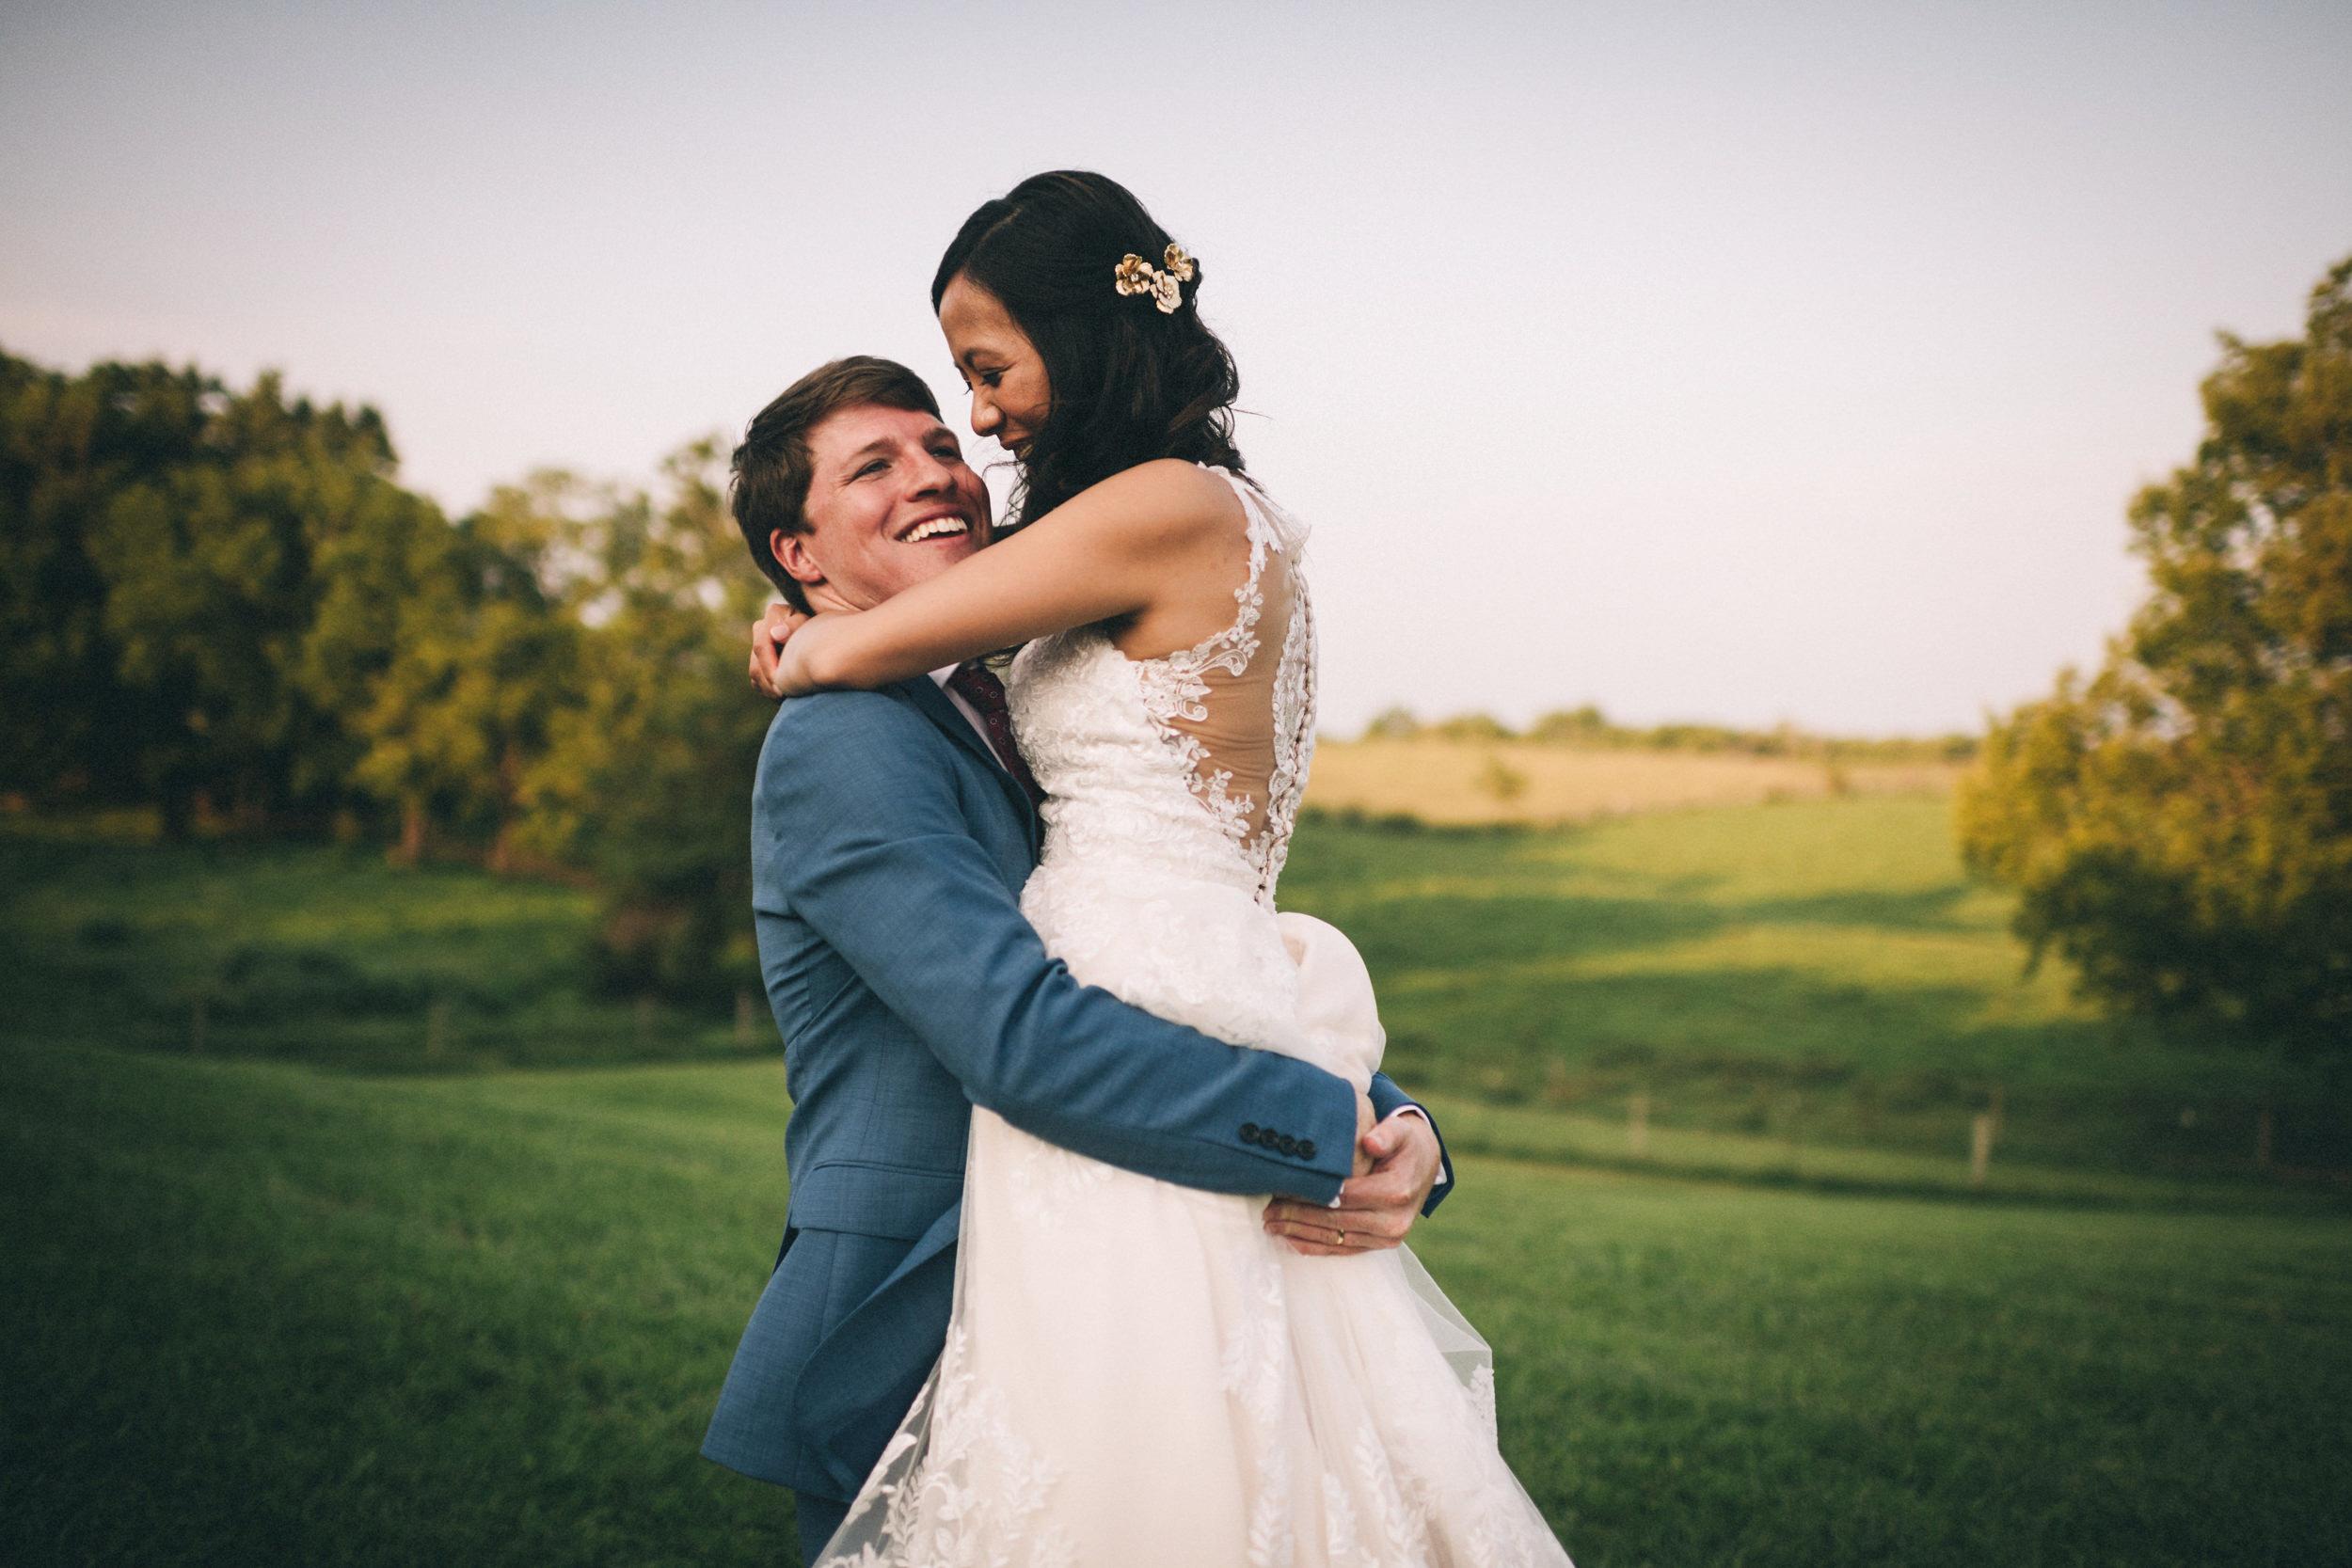 Louisville-Kentucky-Wedding-and-Elopement-Photographer-Sarah-Katherine-Davis-Photography-Summer-Jewel-Toned-Wedding-Chineese-Tea-Ceremony-Warrenwood-Manor-Danville-756.jpg